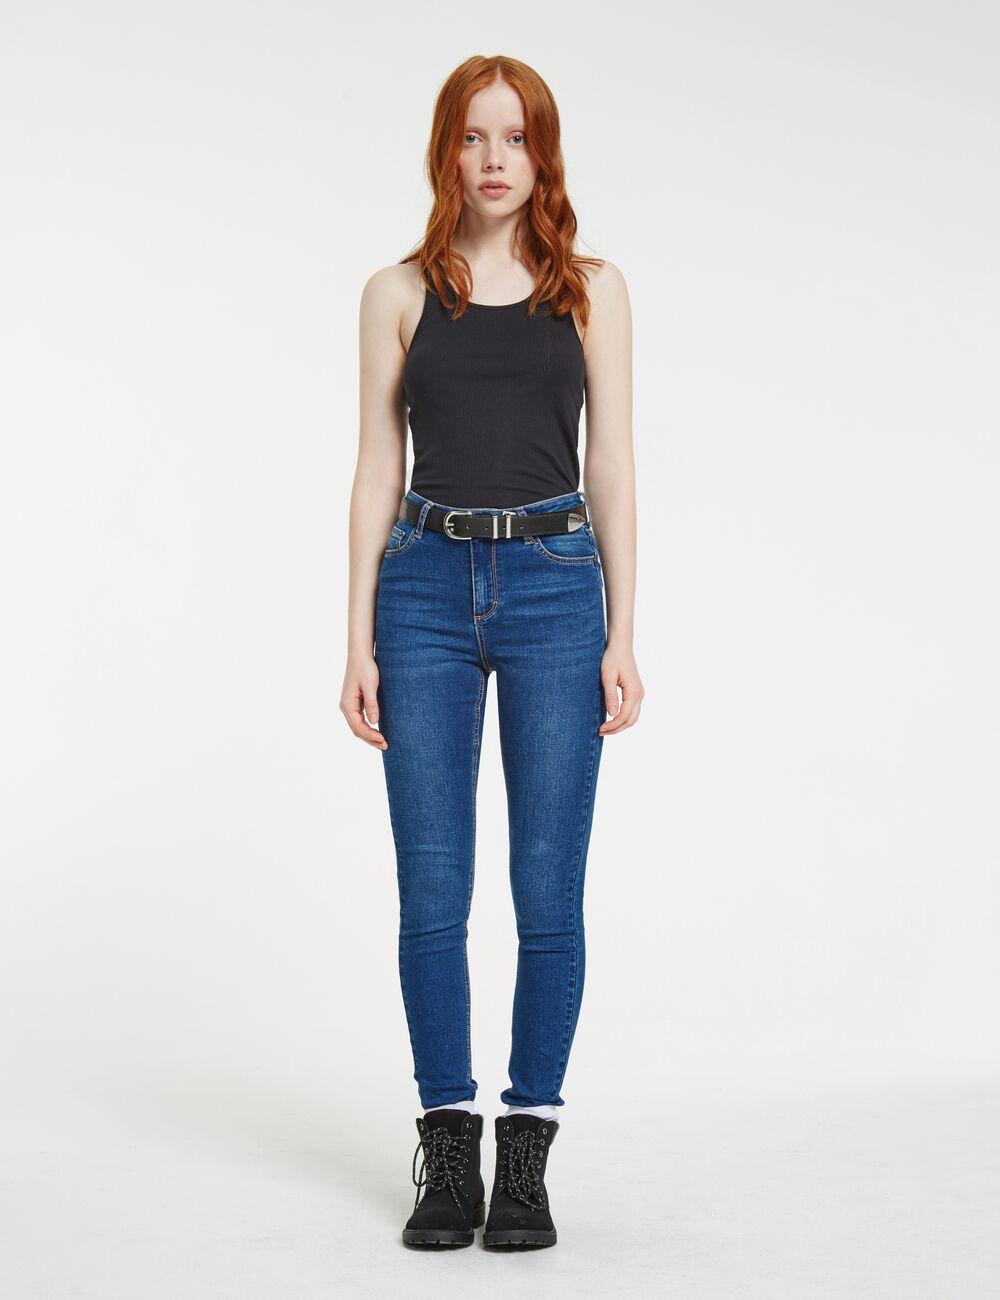 jean femme taille haute slim mode jeans taille haute skinny jeans extensible femmes pantalon. Black Bedroom Furniture Sets. Home Design Ideas